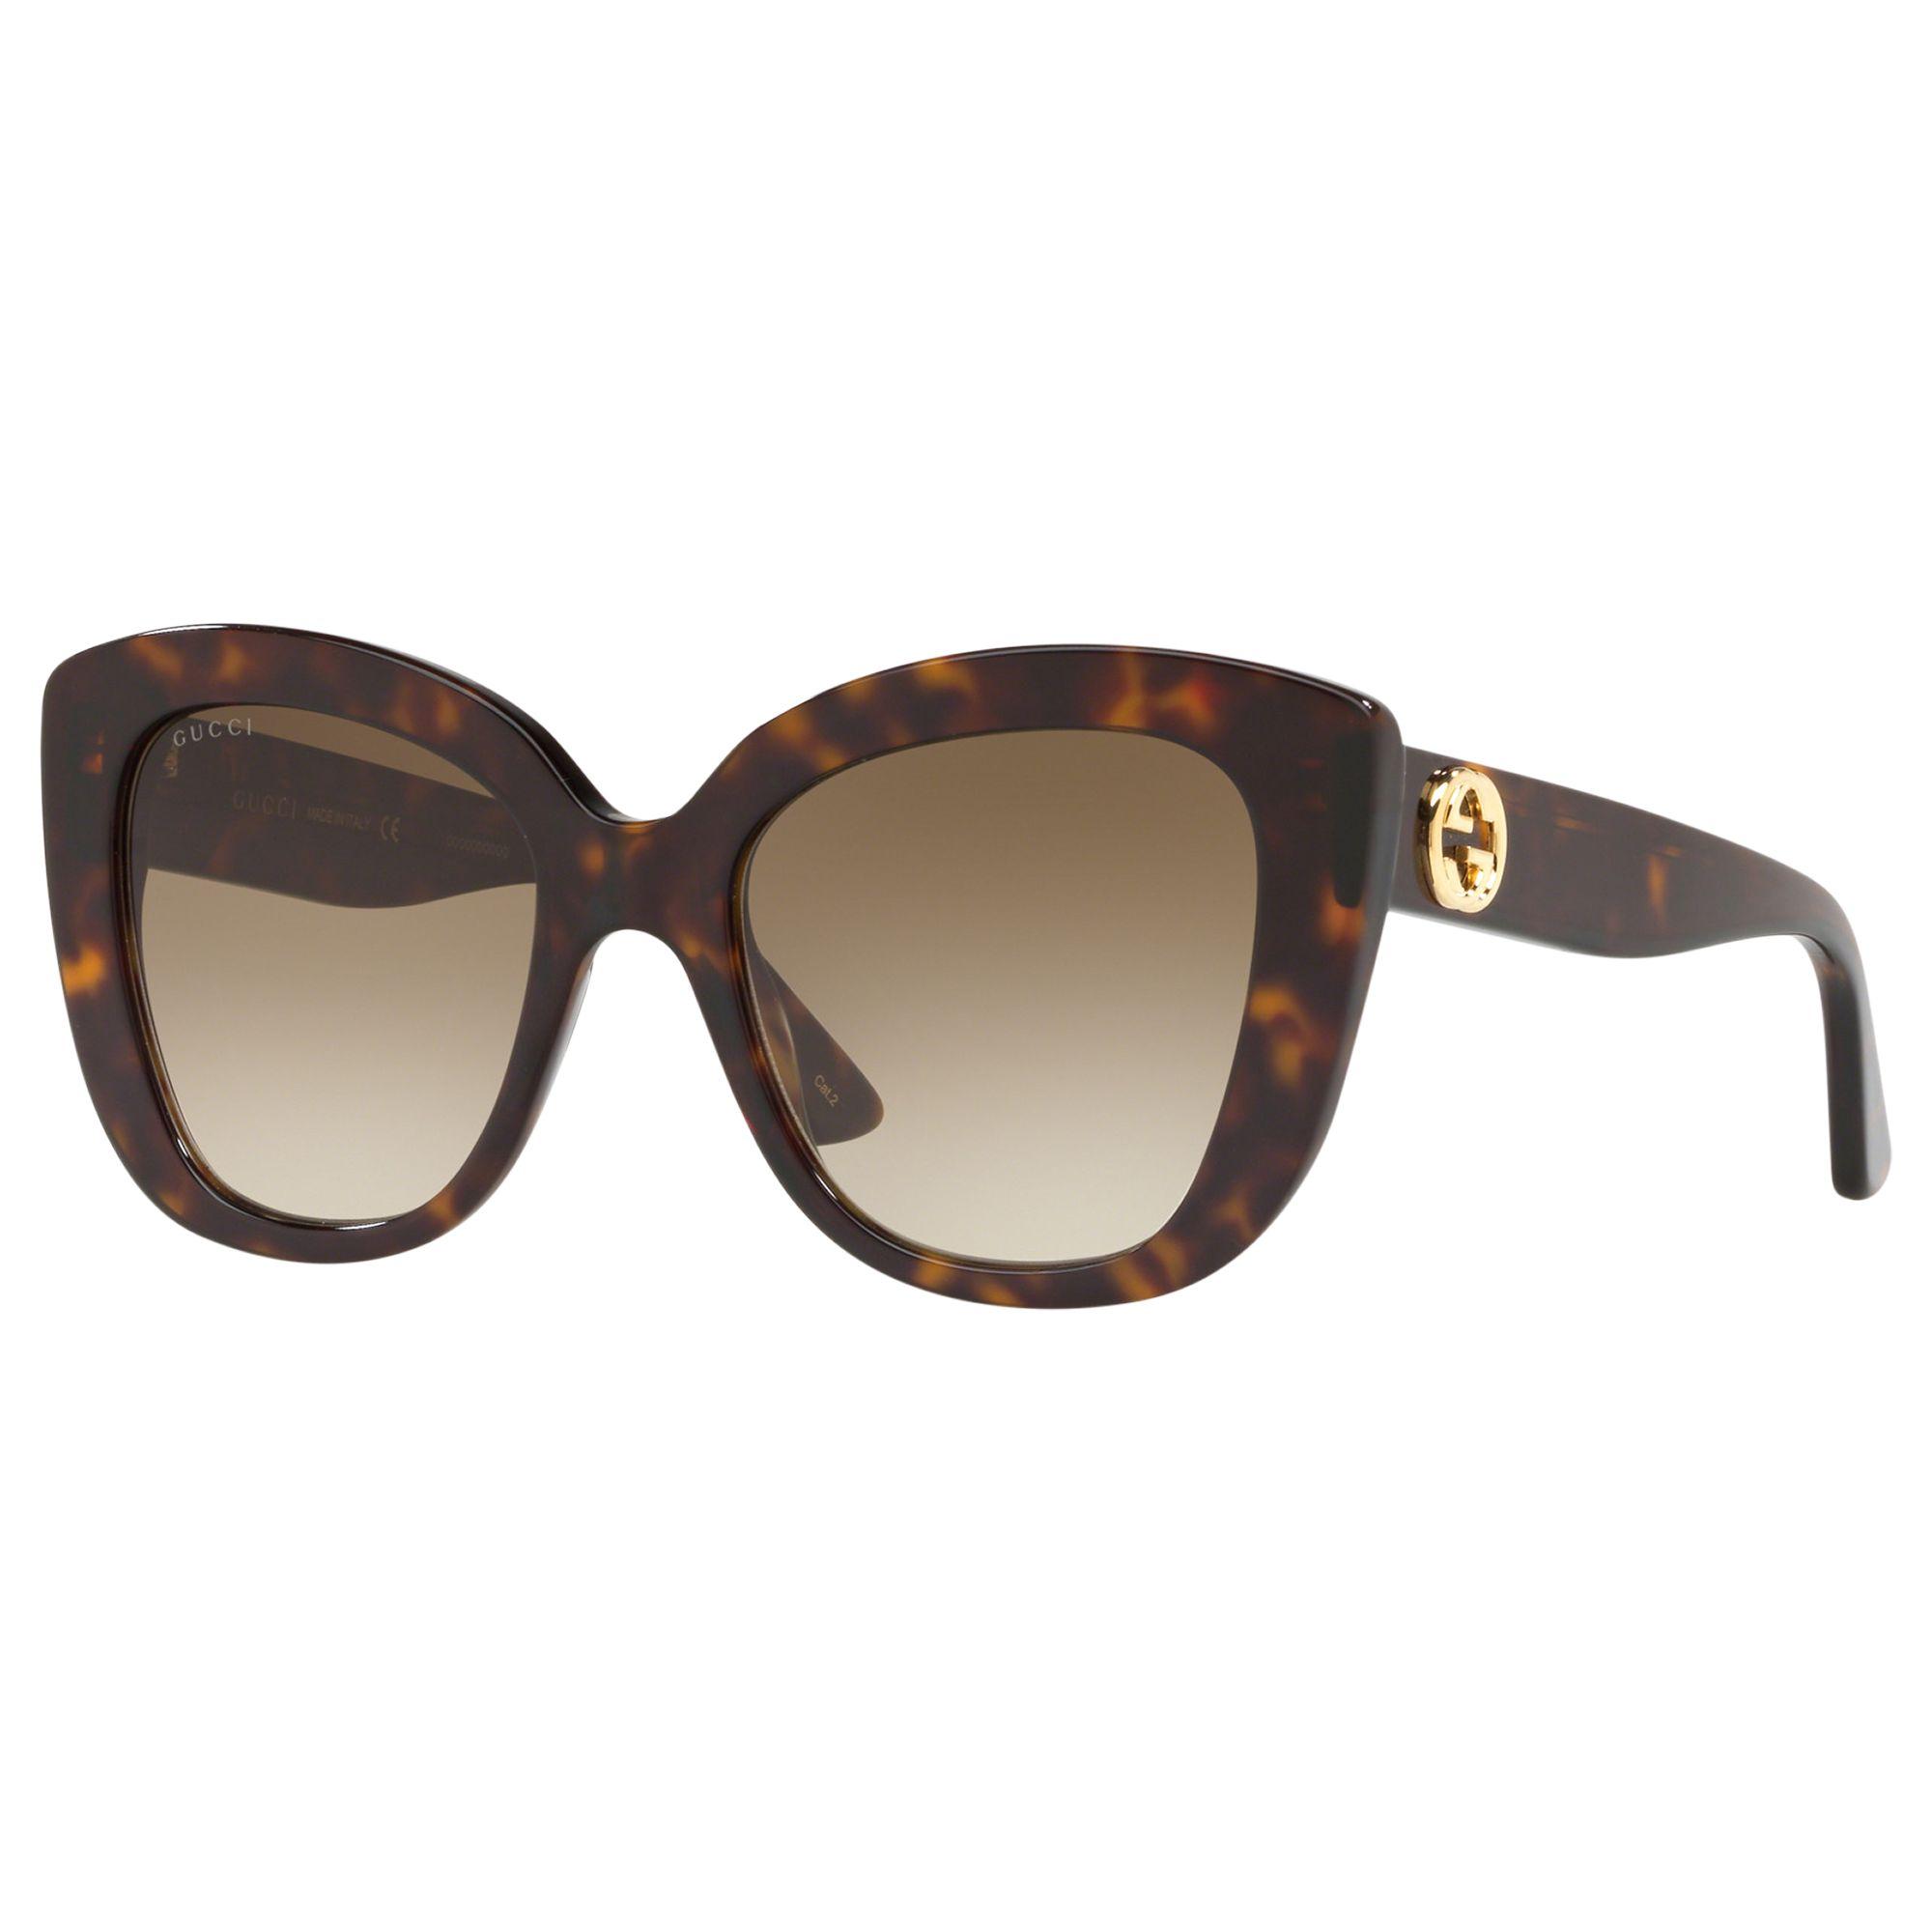 Gucci Gucci GG0327S Women's Cat's Eye Sunglasses